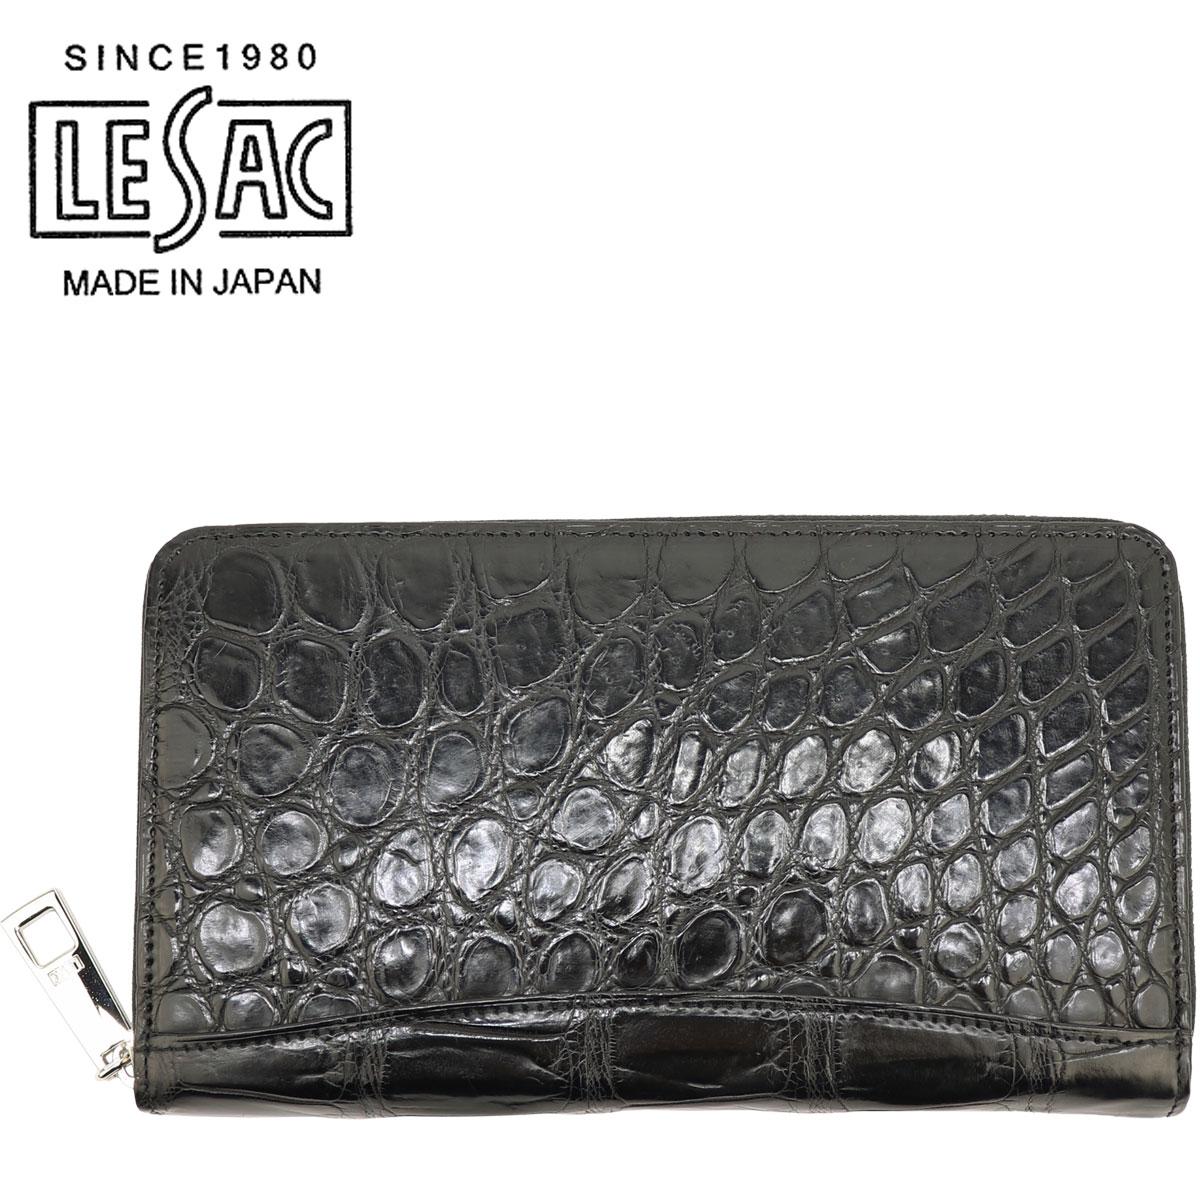 LE'SAC レザック クロコダイル ポロサス ラウンドジップ 長財布 8129(ブラック)